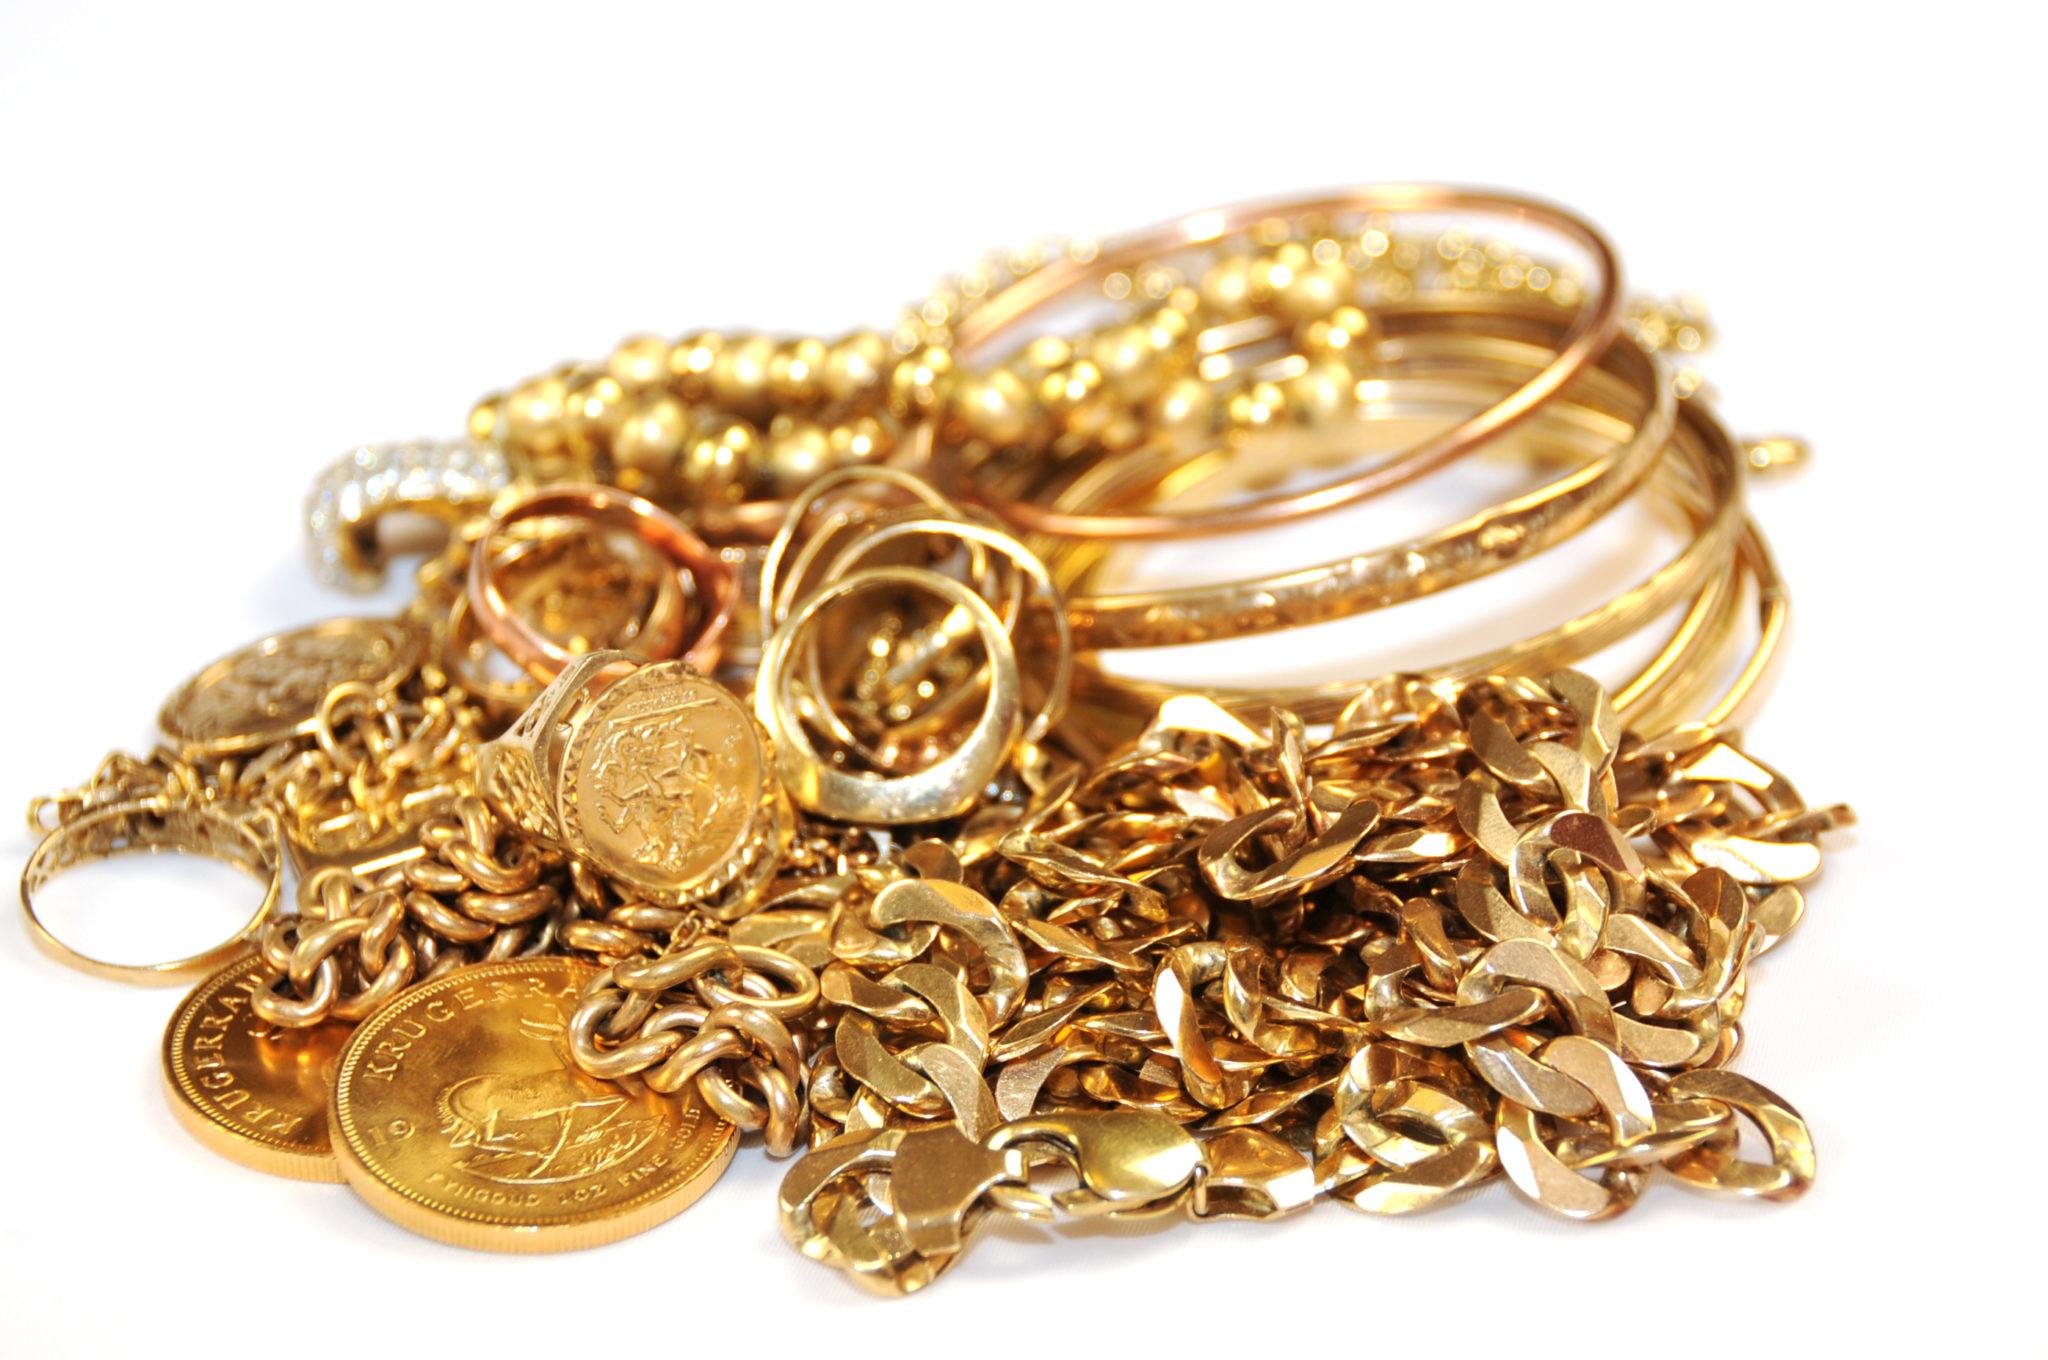 ubi-gold-loan